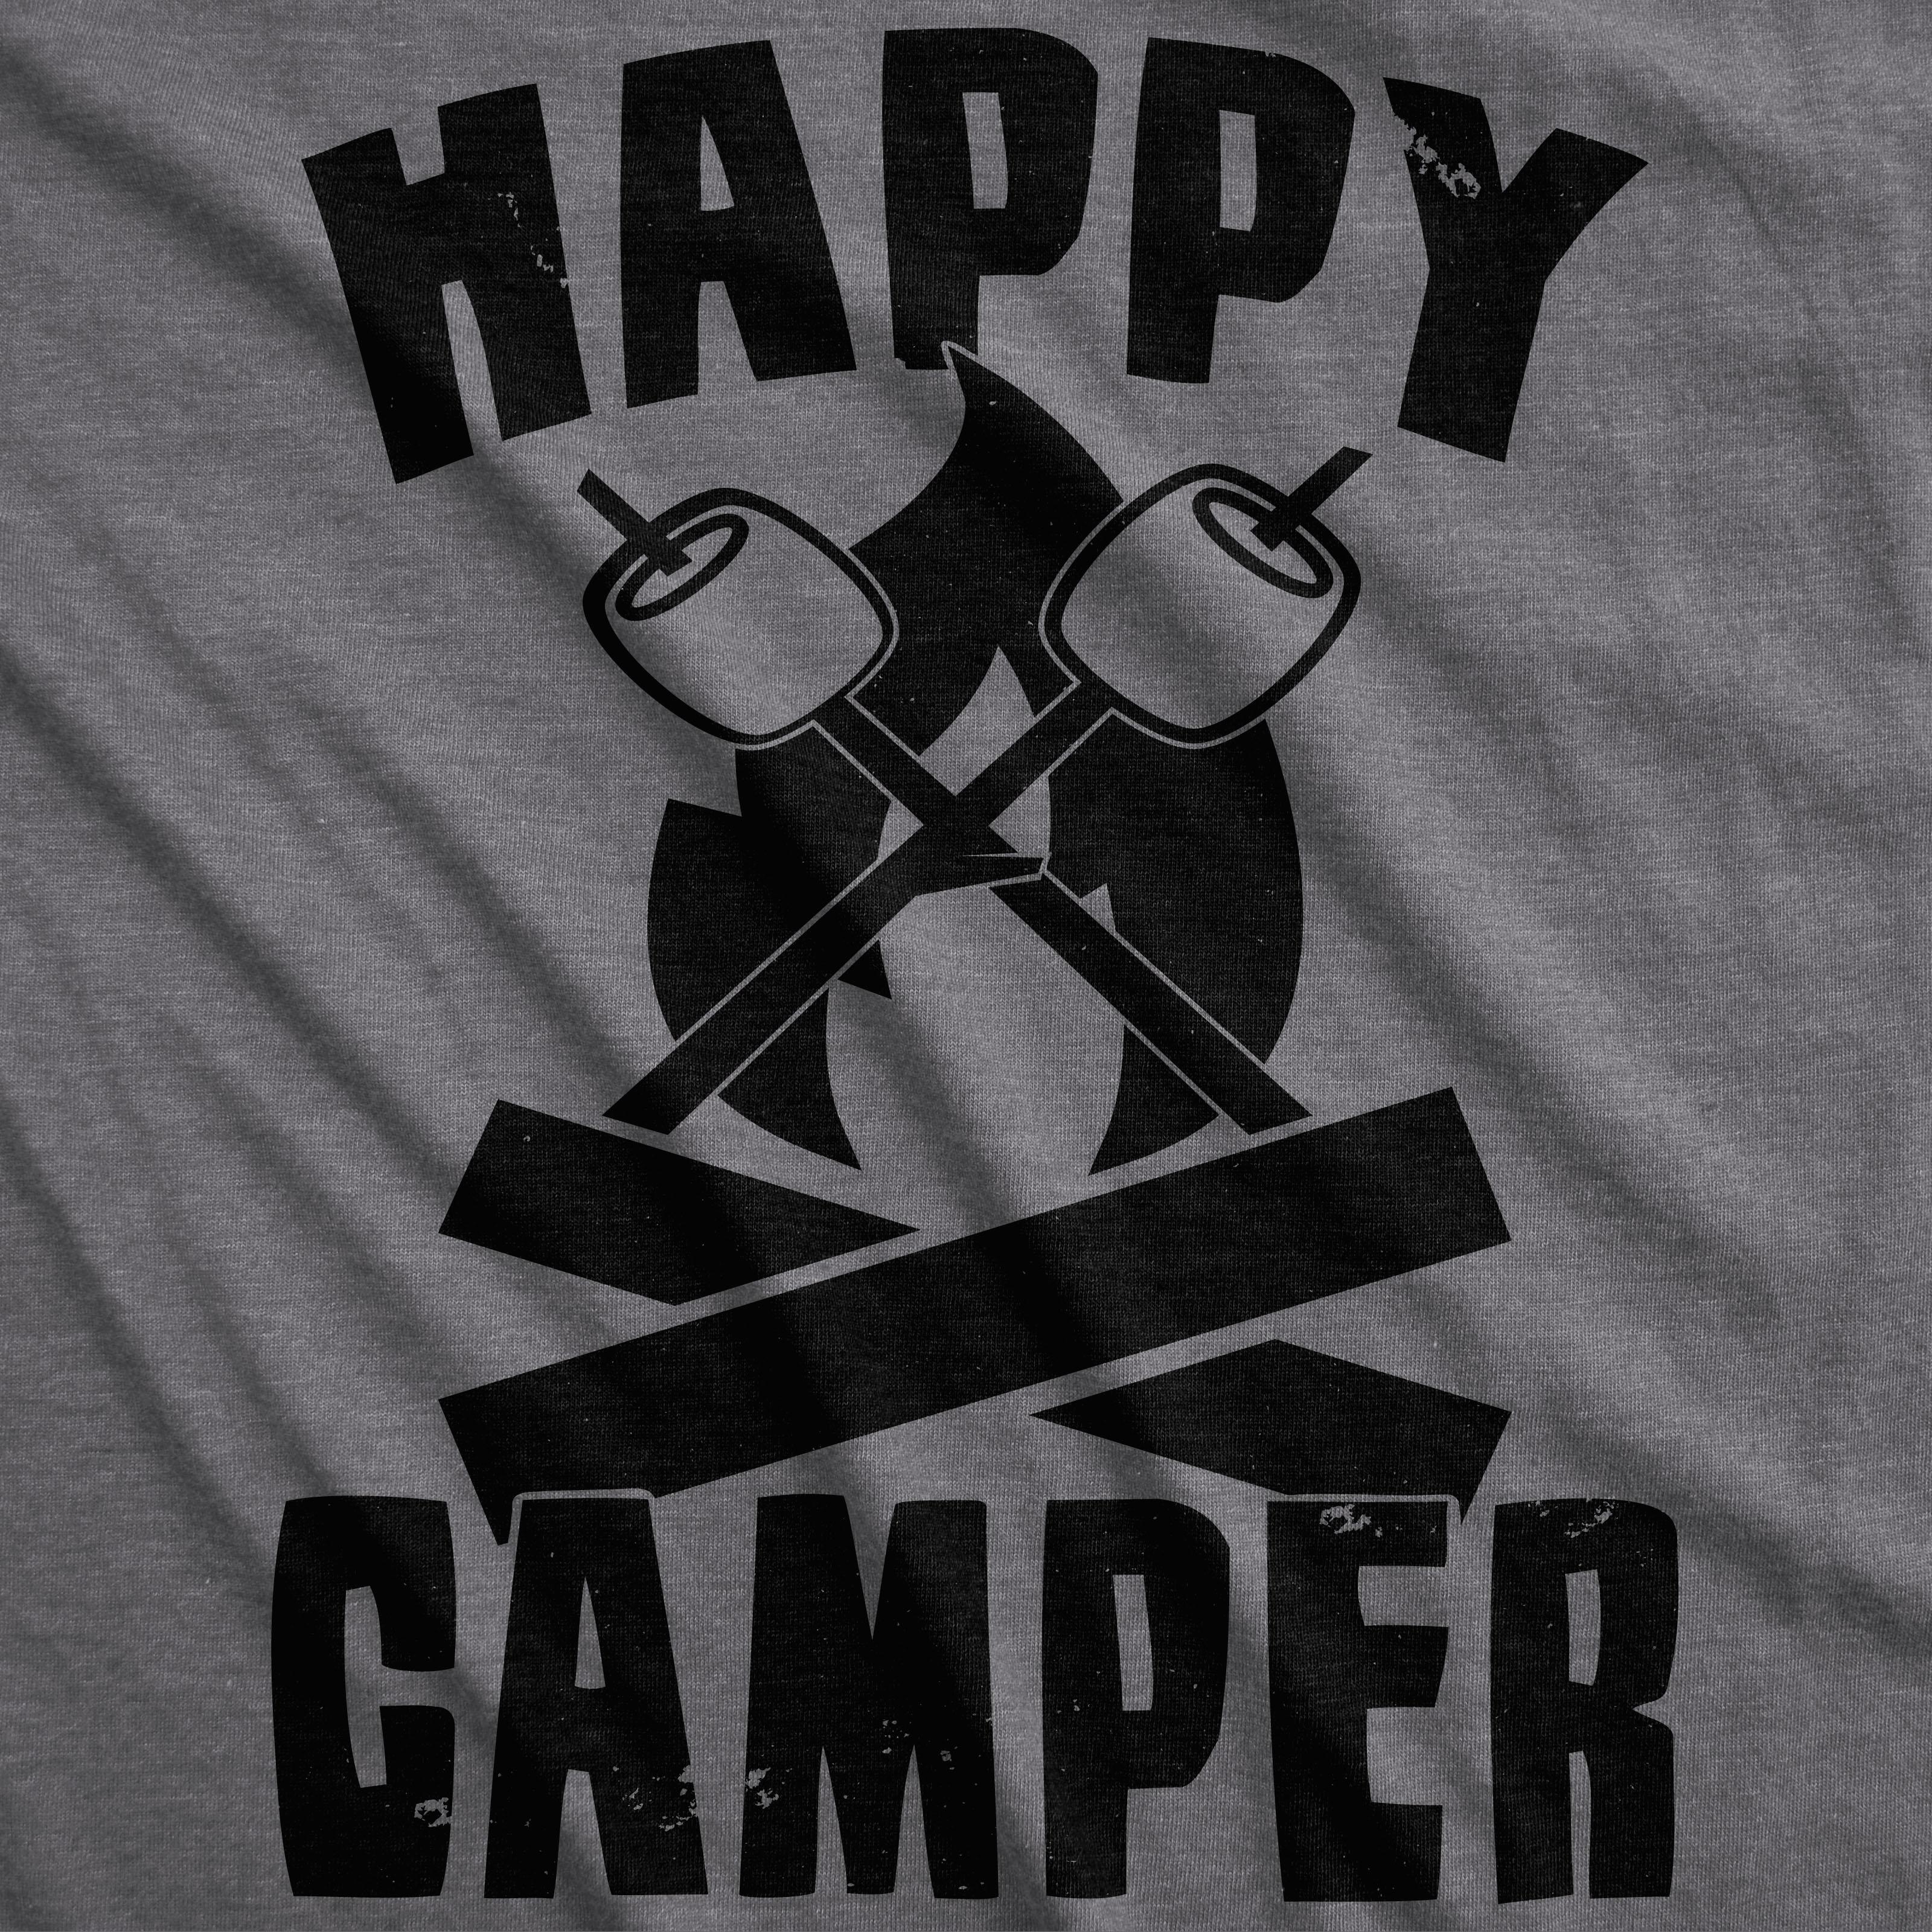 dffc510fa2 Mens Happy Camper Shirt Funny Camping Shirts Cool Vintage Tees Retro ...